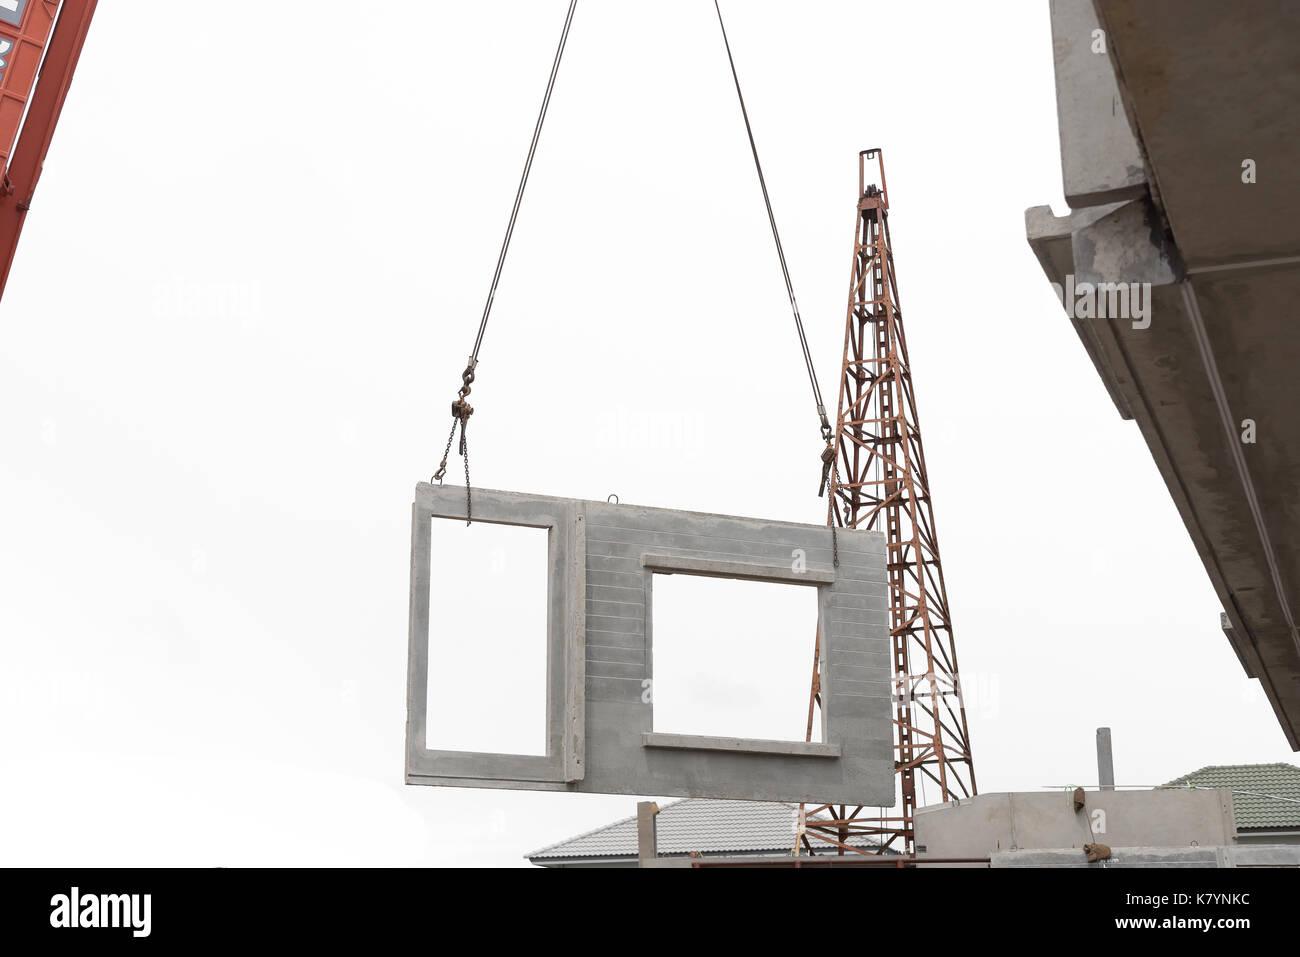 Construction site crane is lifting a precast concrete wall